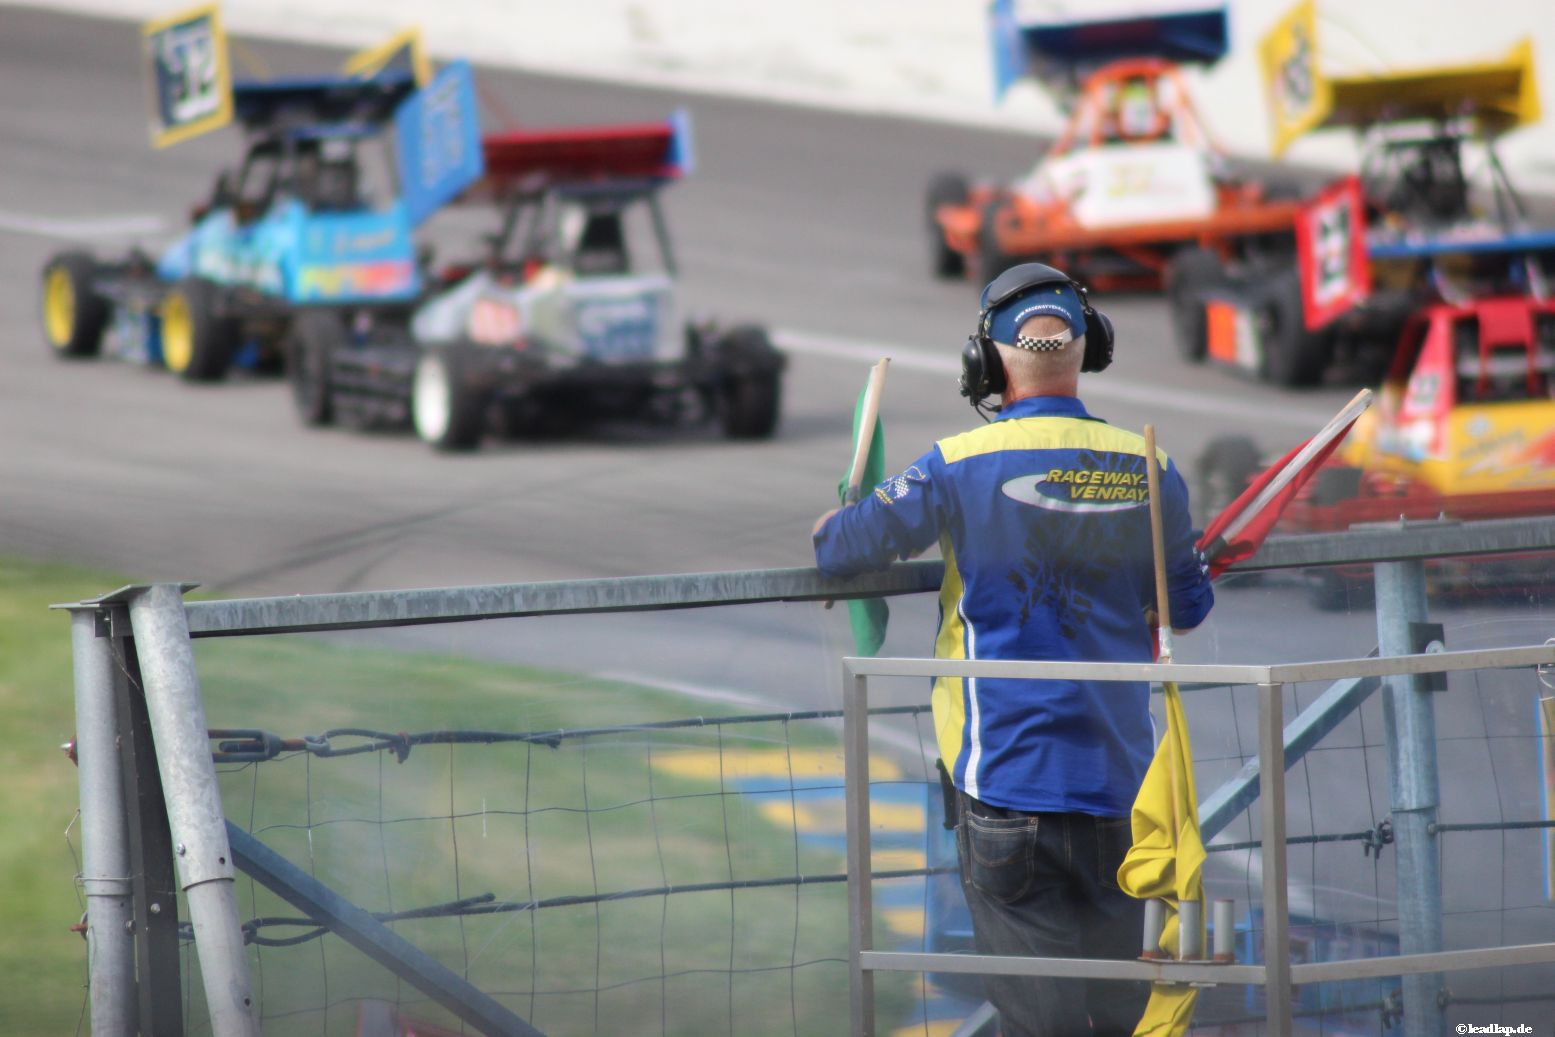 Marshall auf dem Raceway Venray © André Wiegold